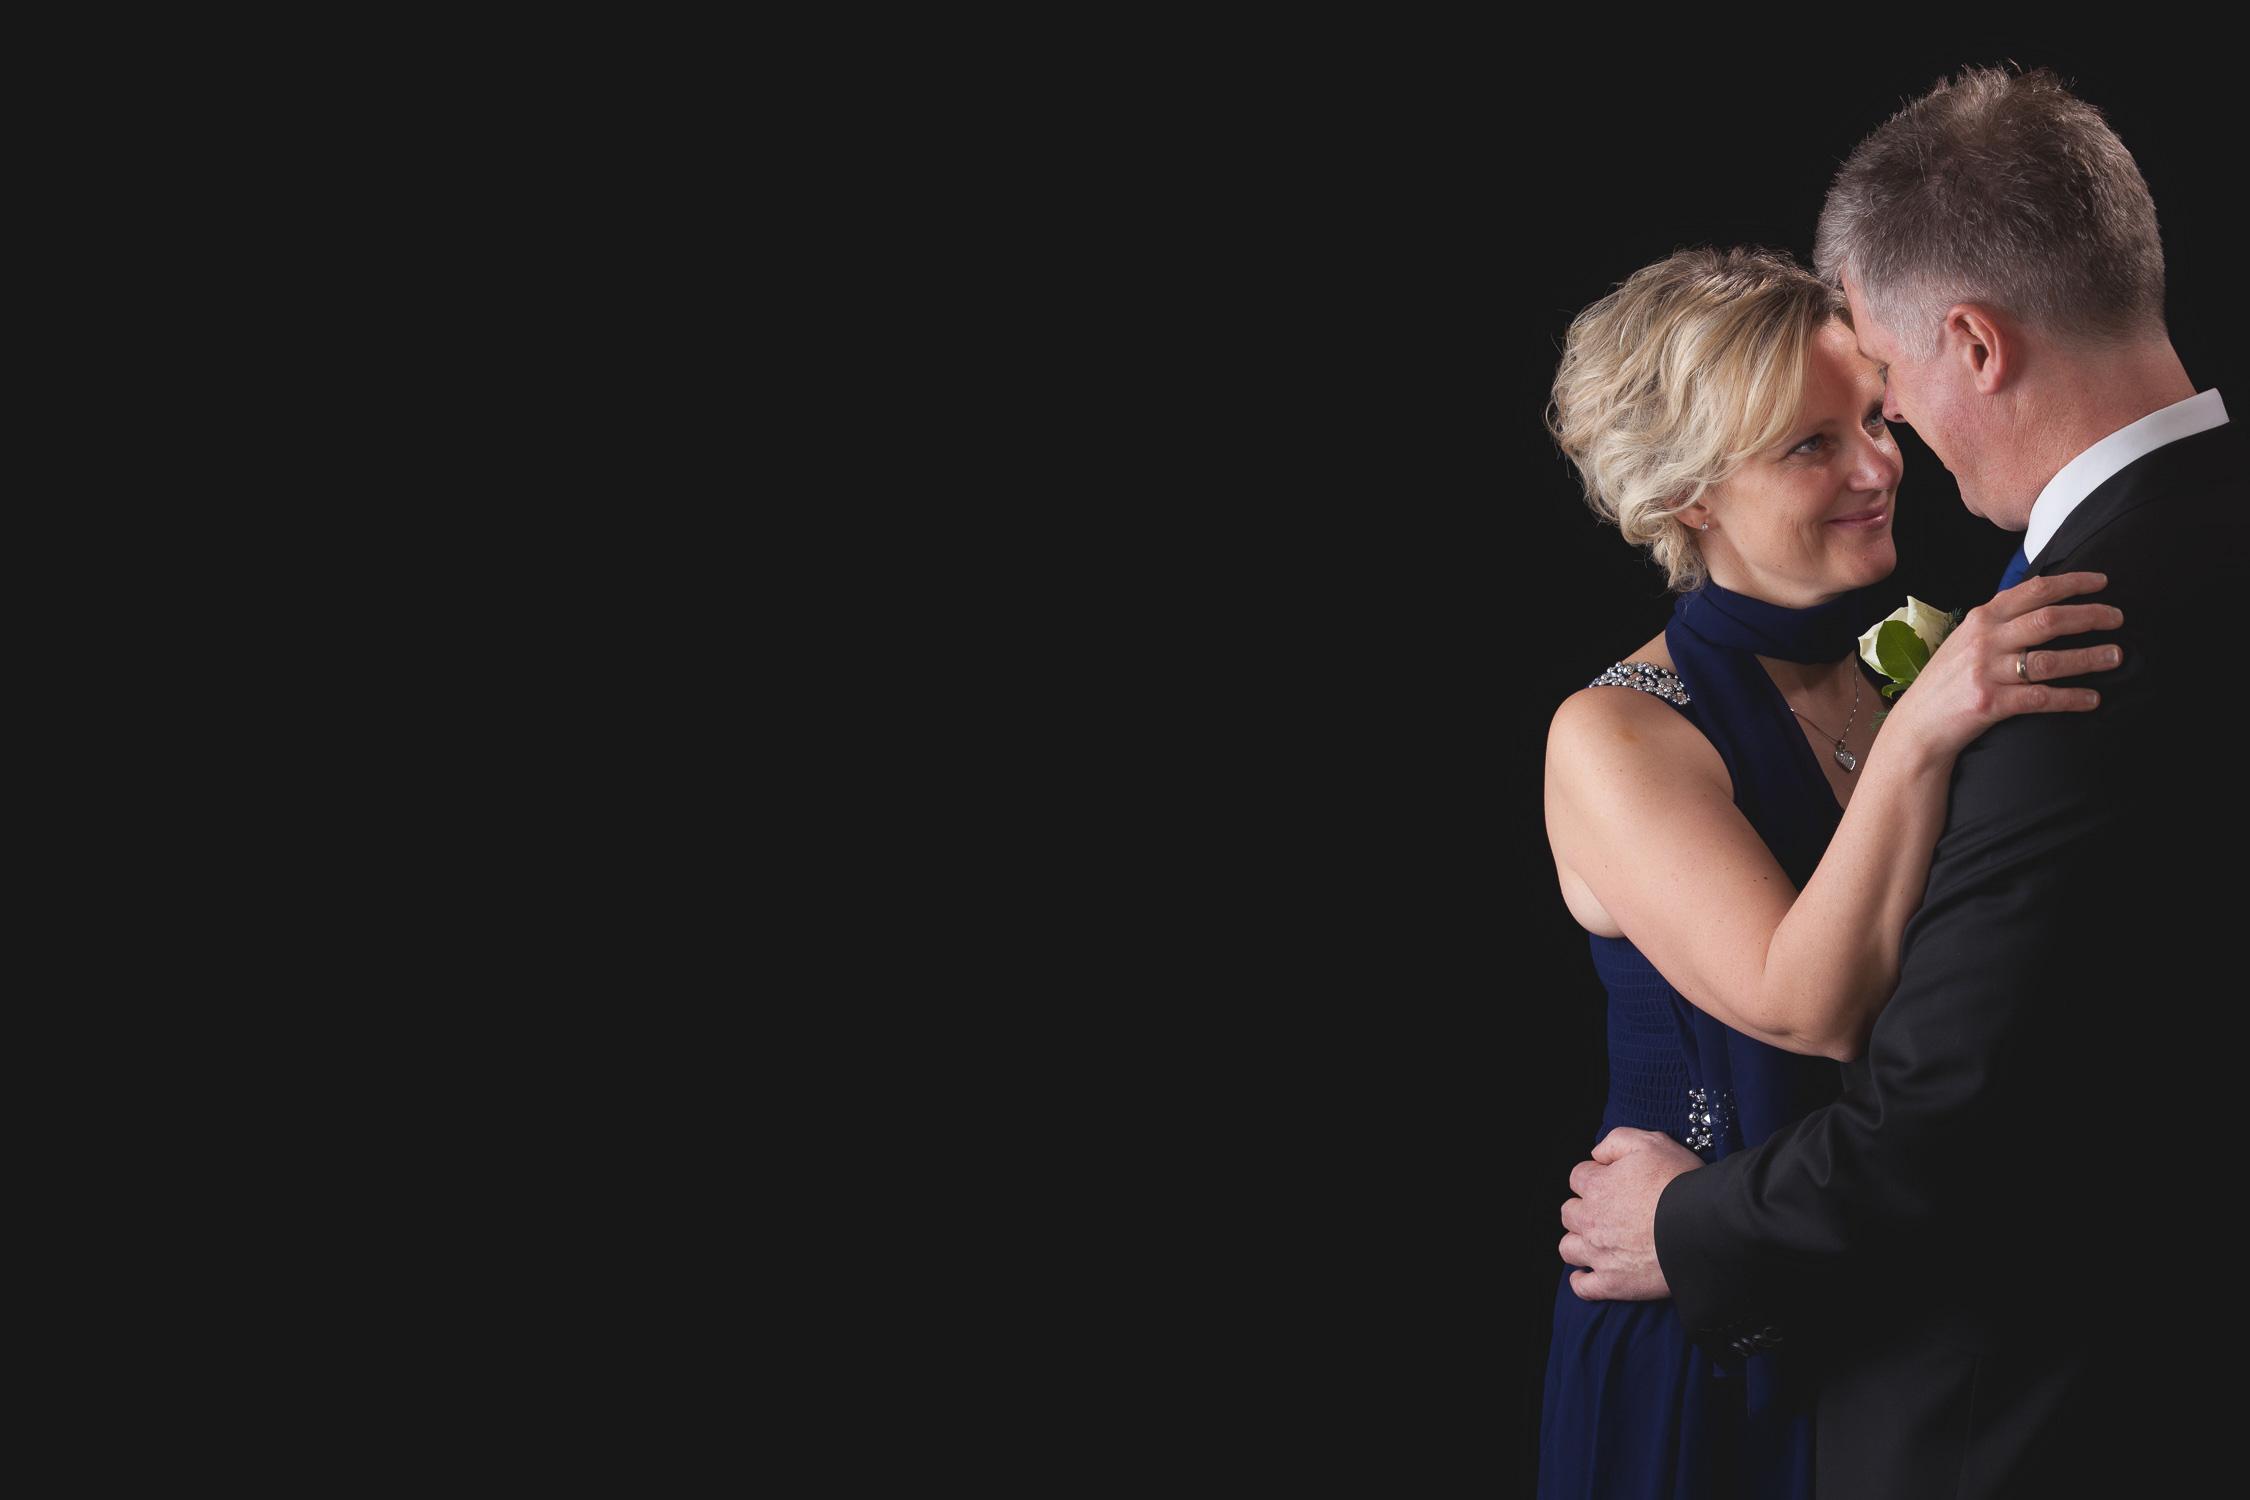 bryllup-bryllupsfotograf-bryllupsfotografering-kjæreste-kjærestefotograf-kjærestefotografering-sarpsborg-hodne-design-pål-hodne-